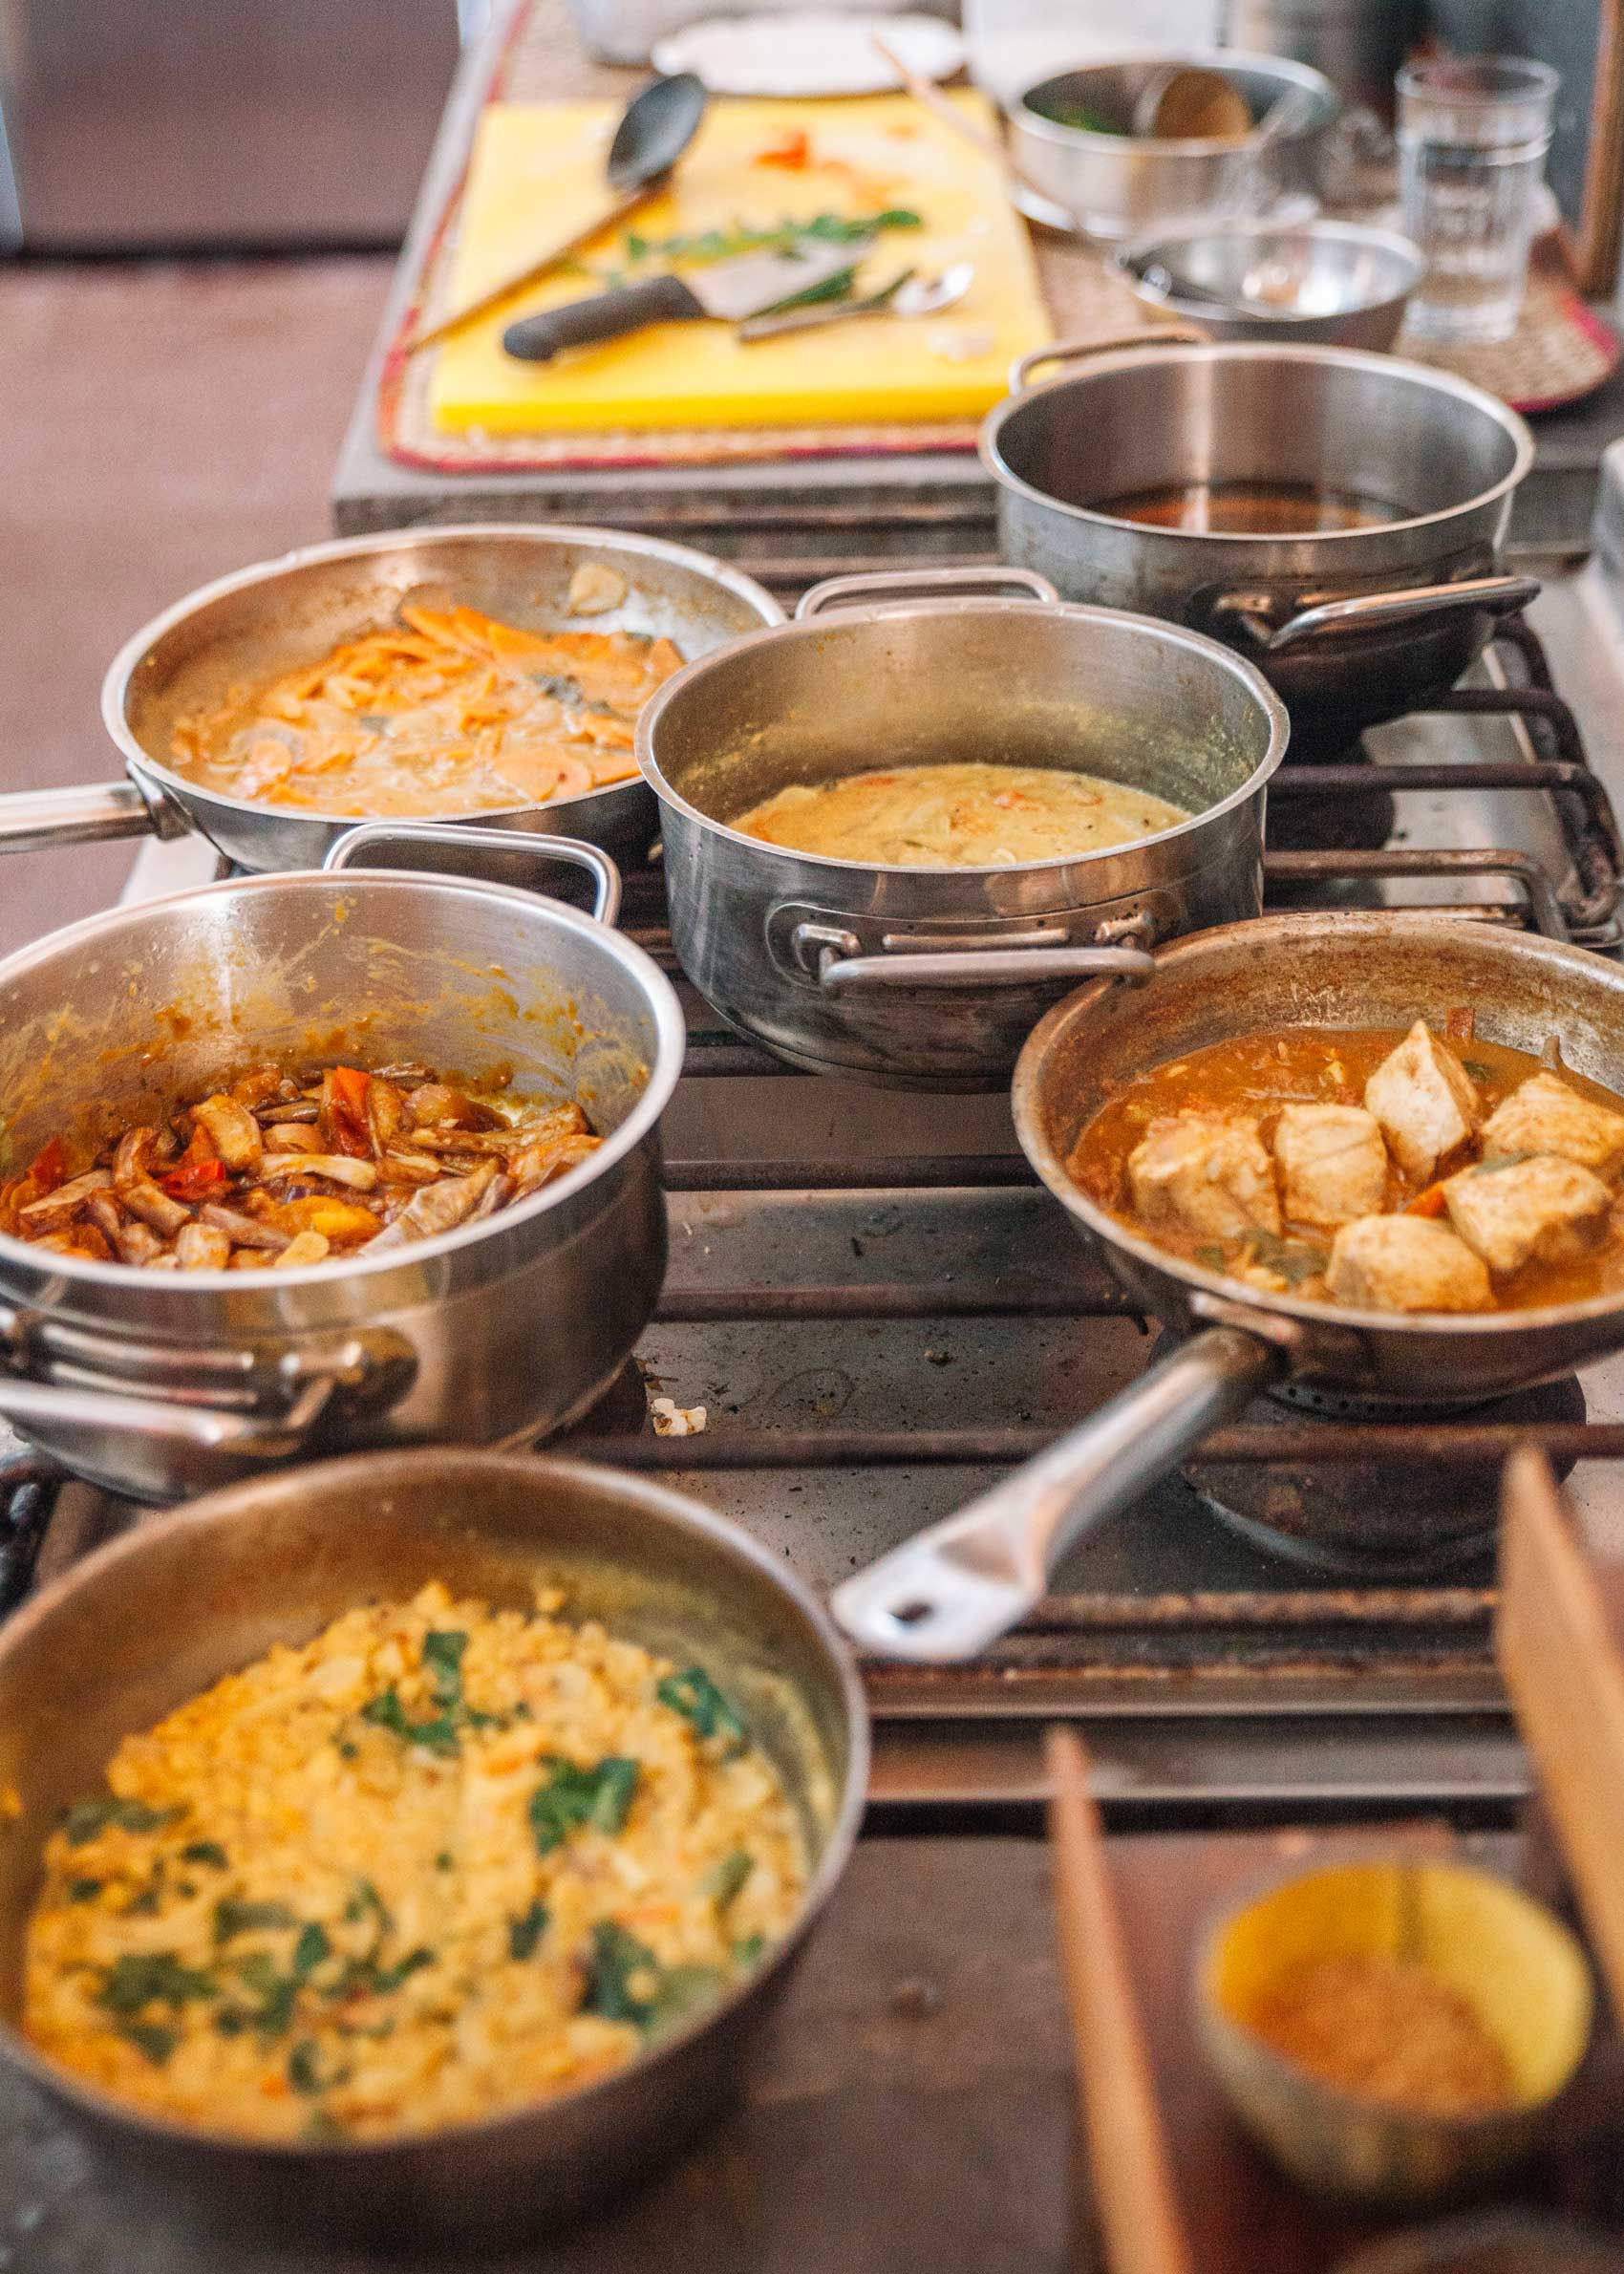 UTMT Sri Lanka - clases de cocina en Sri Lanka